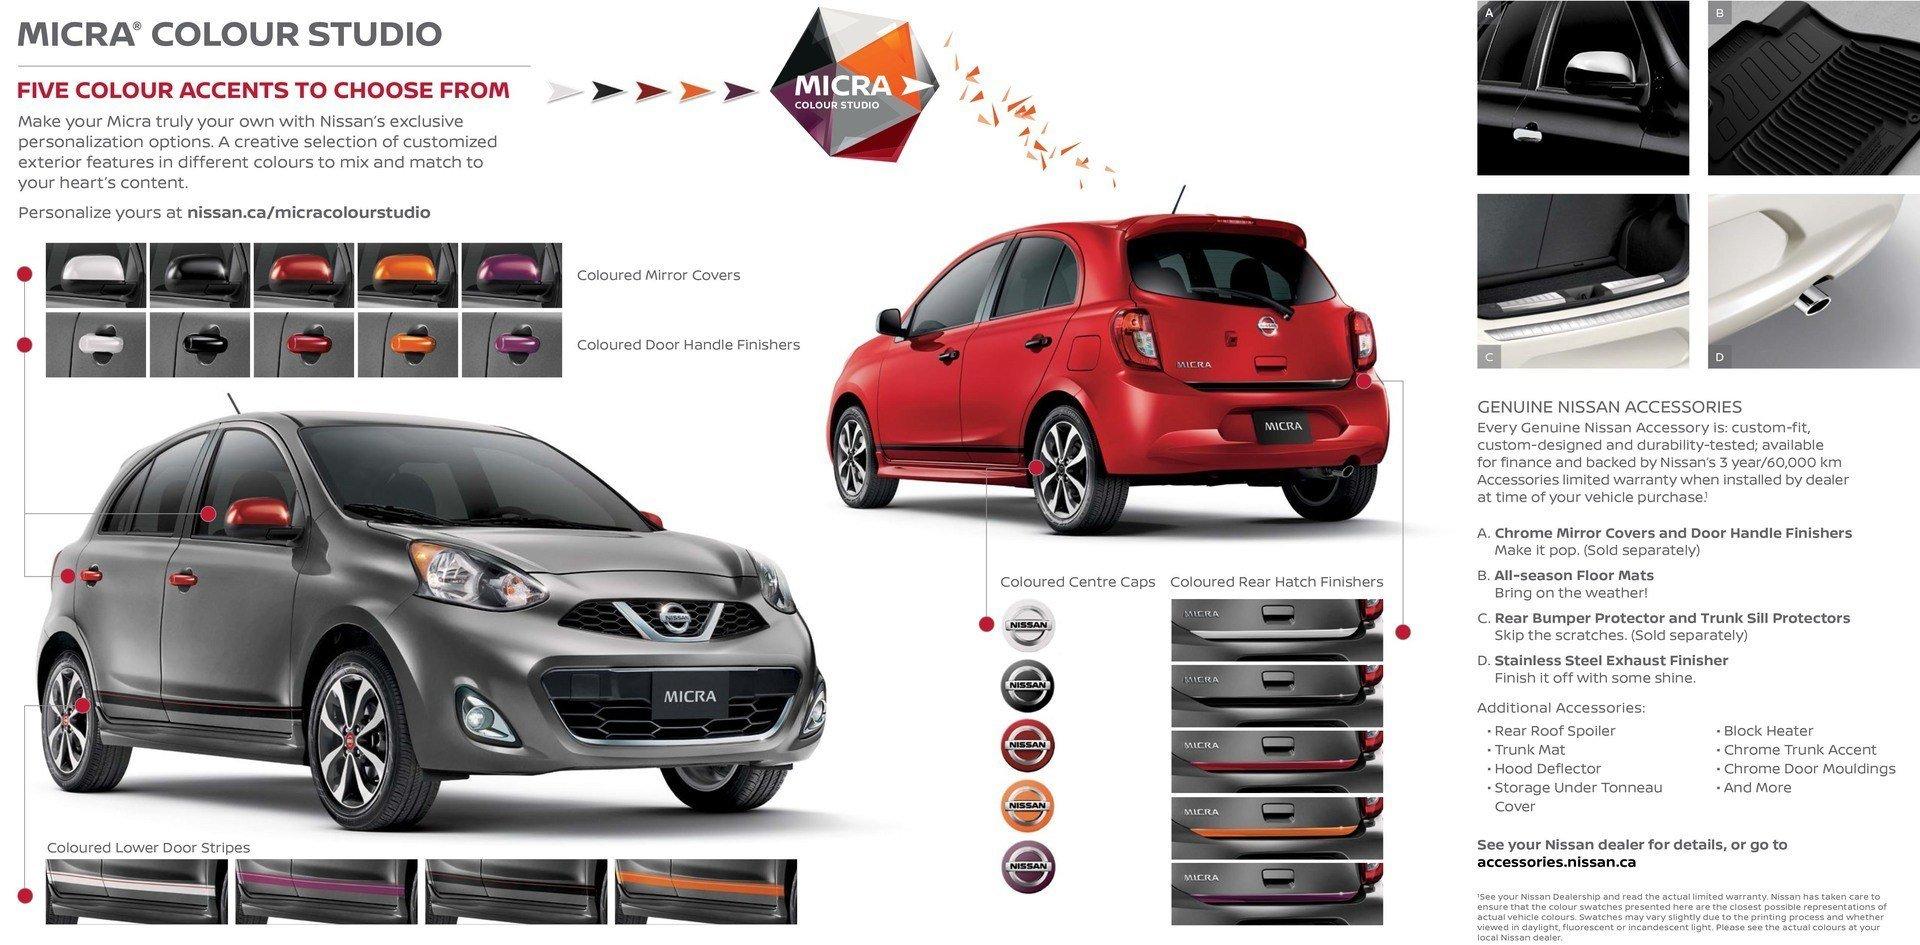 Nissan Micra interior photo